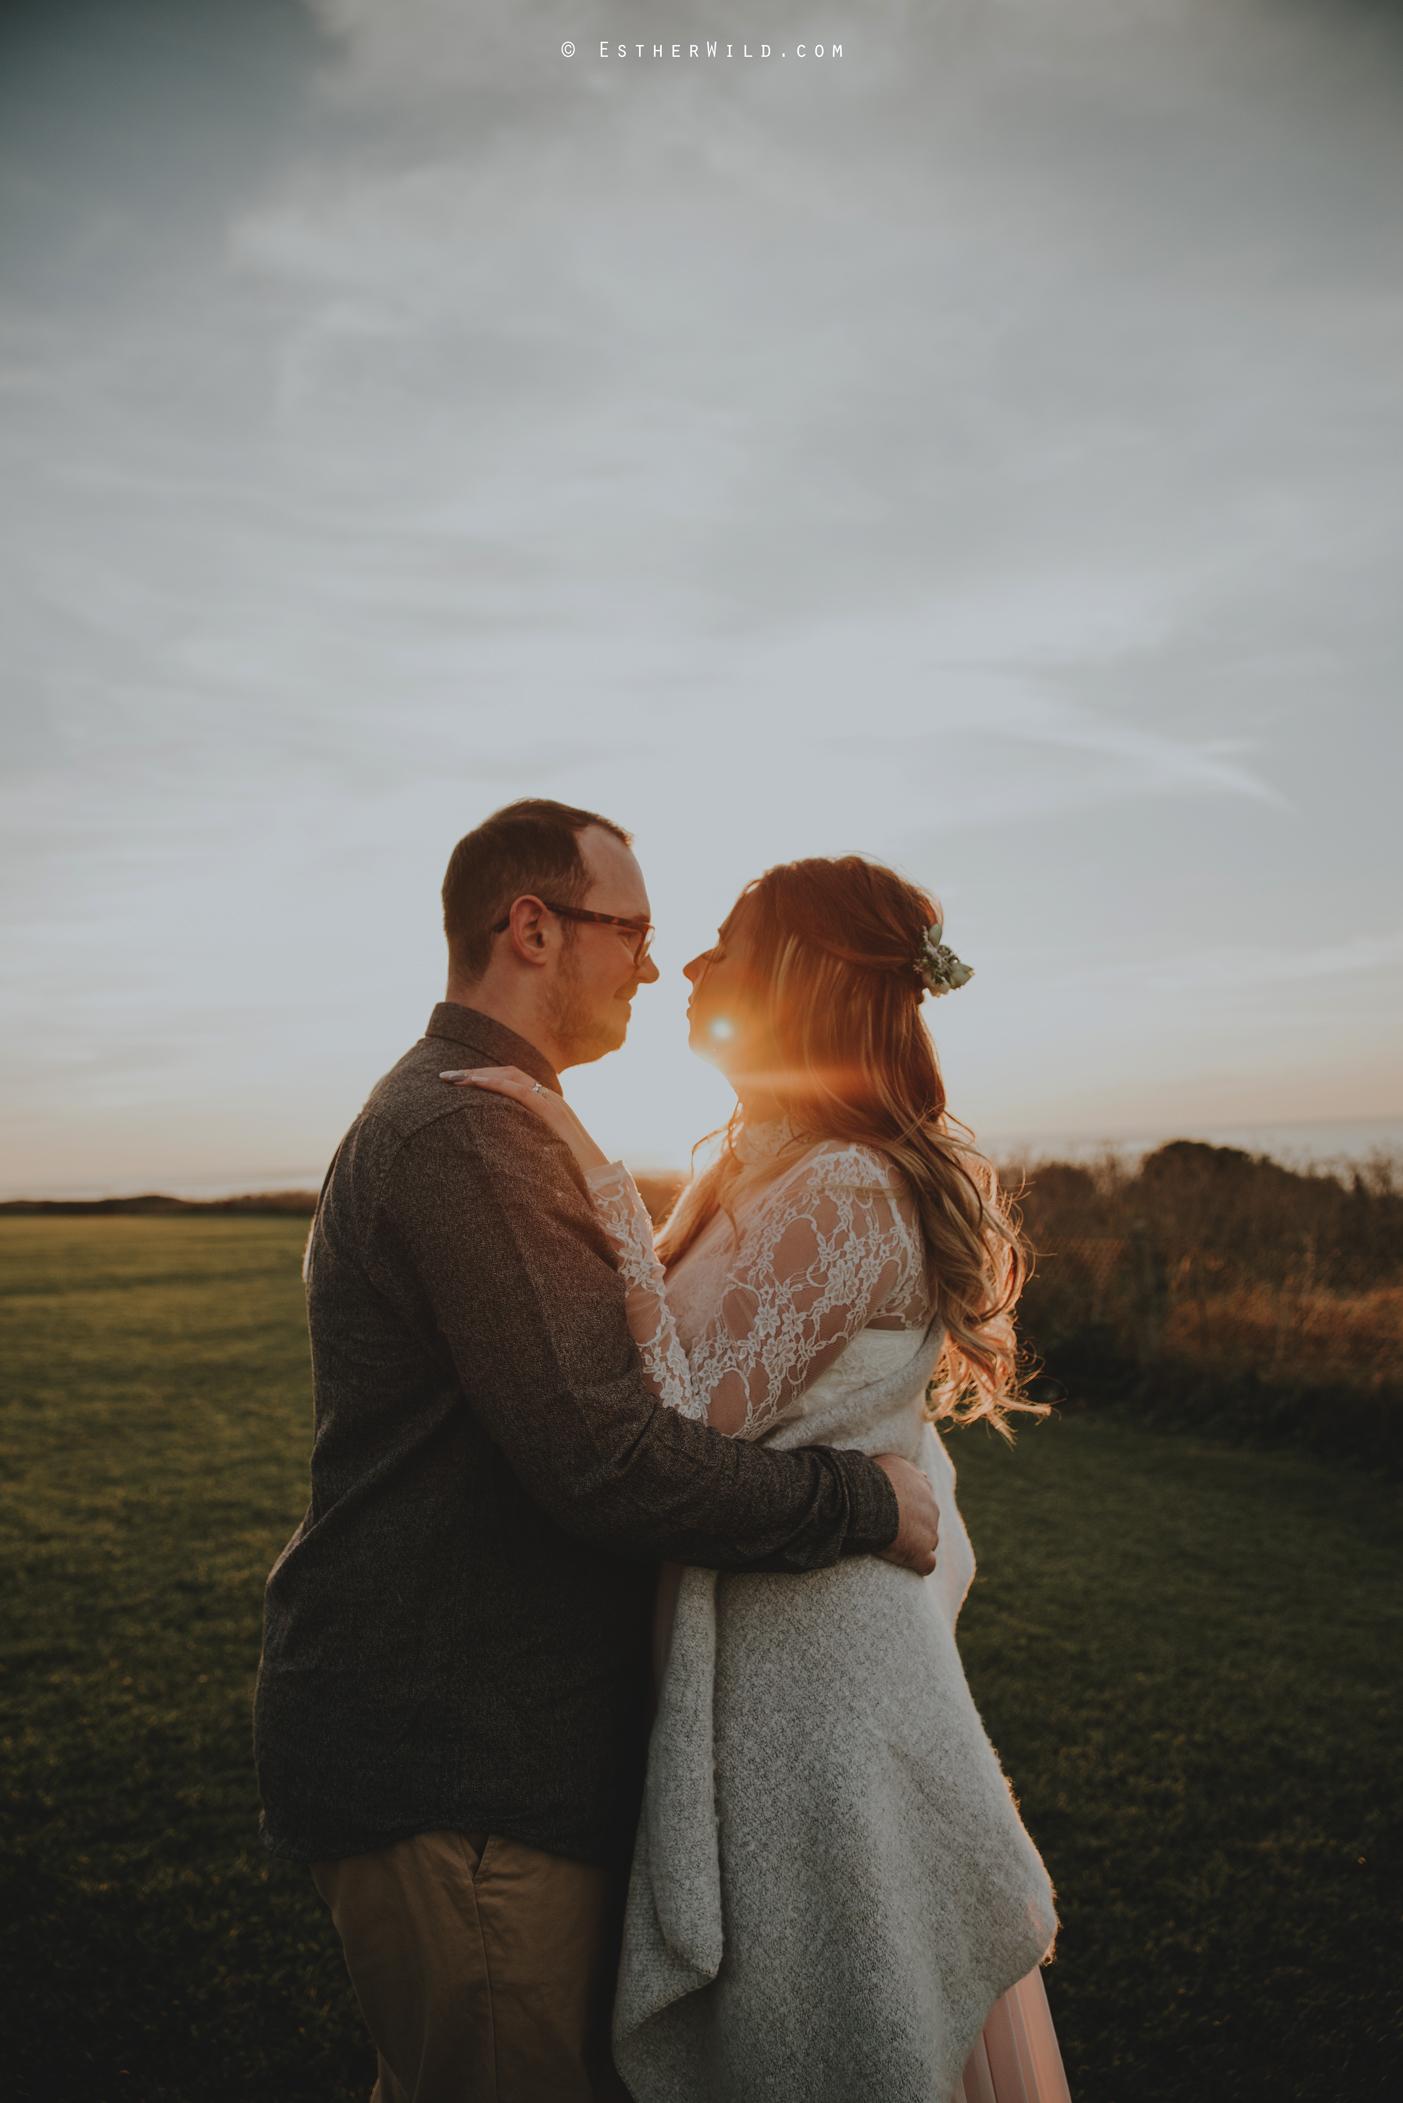 Couple_Anniversary_Wedding_Photography_Hunstanton_Norfolk_Esther_Wild_Share_Copy_IMG_9085.jpg